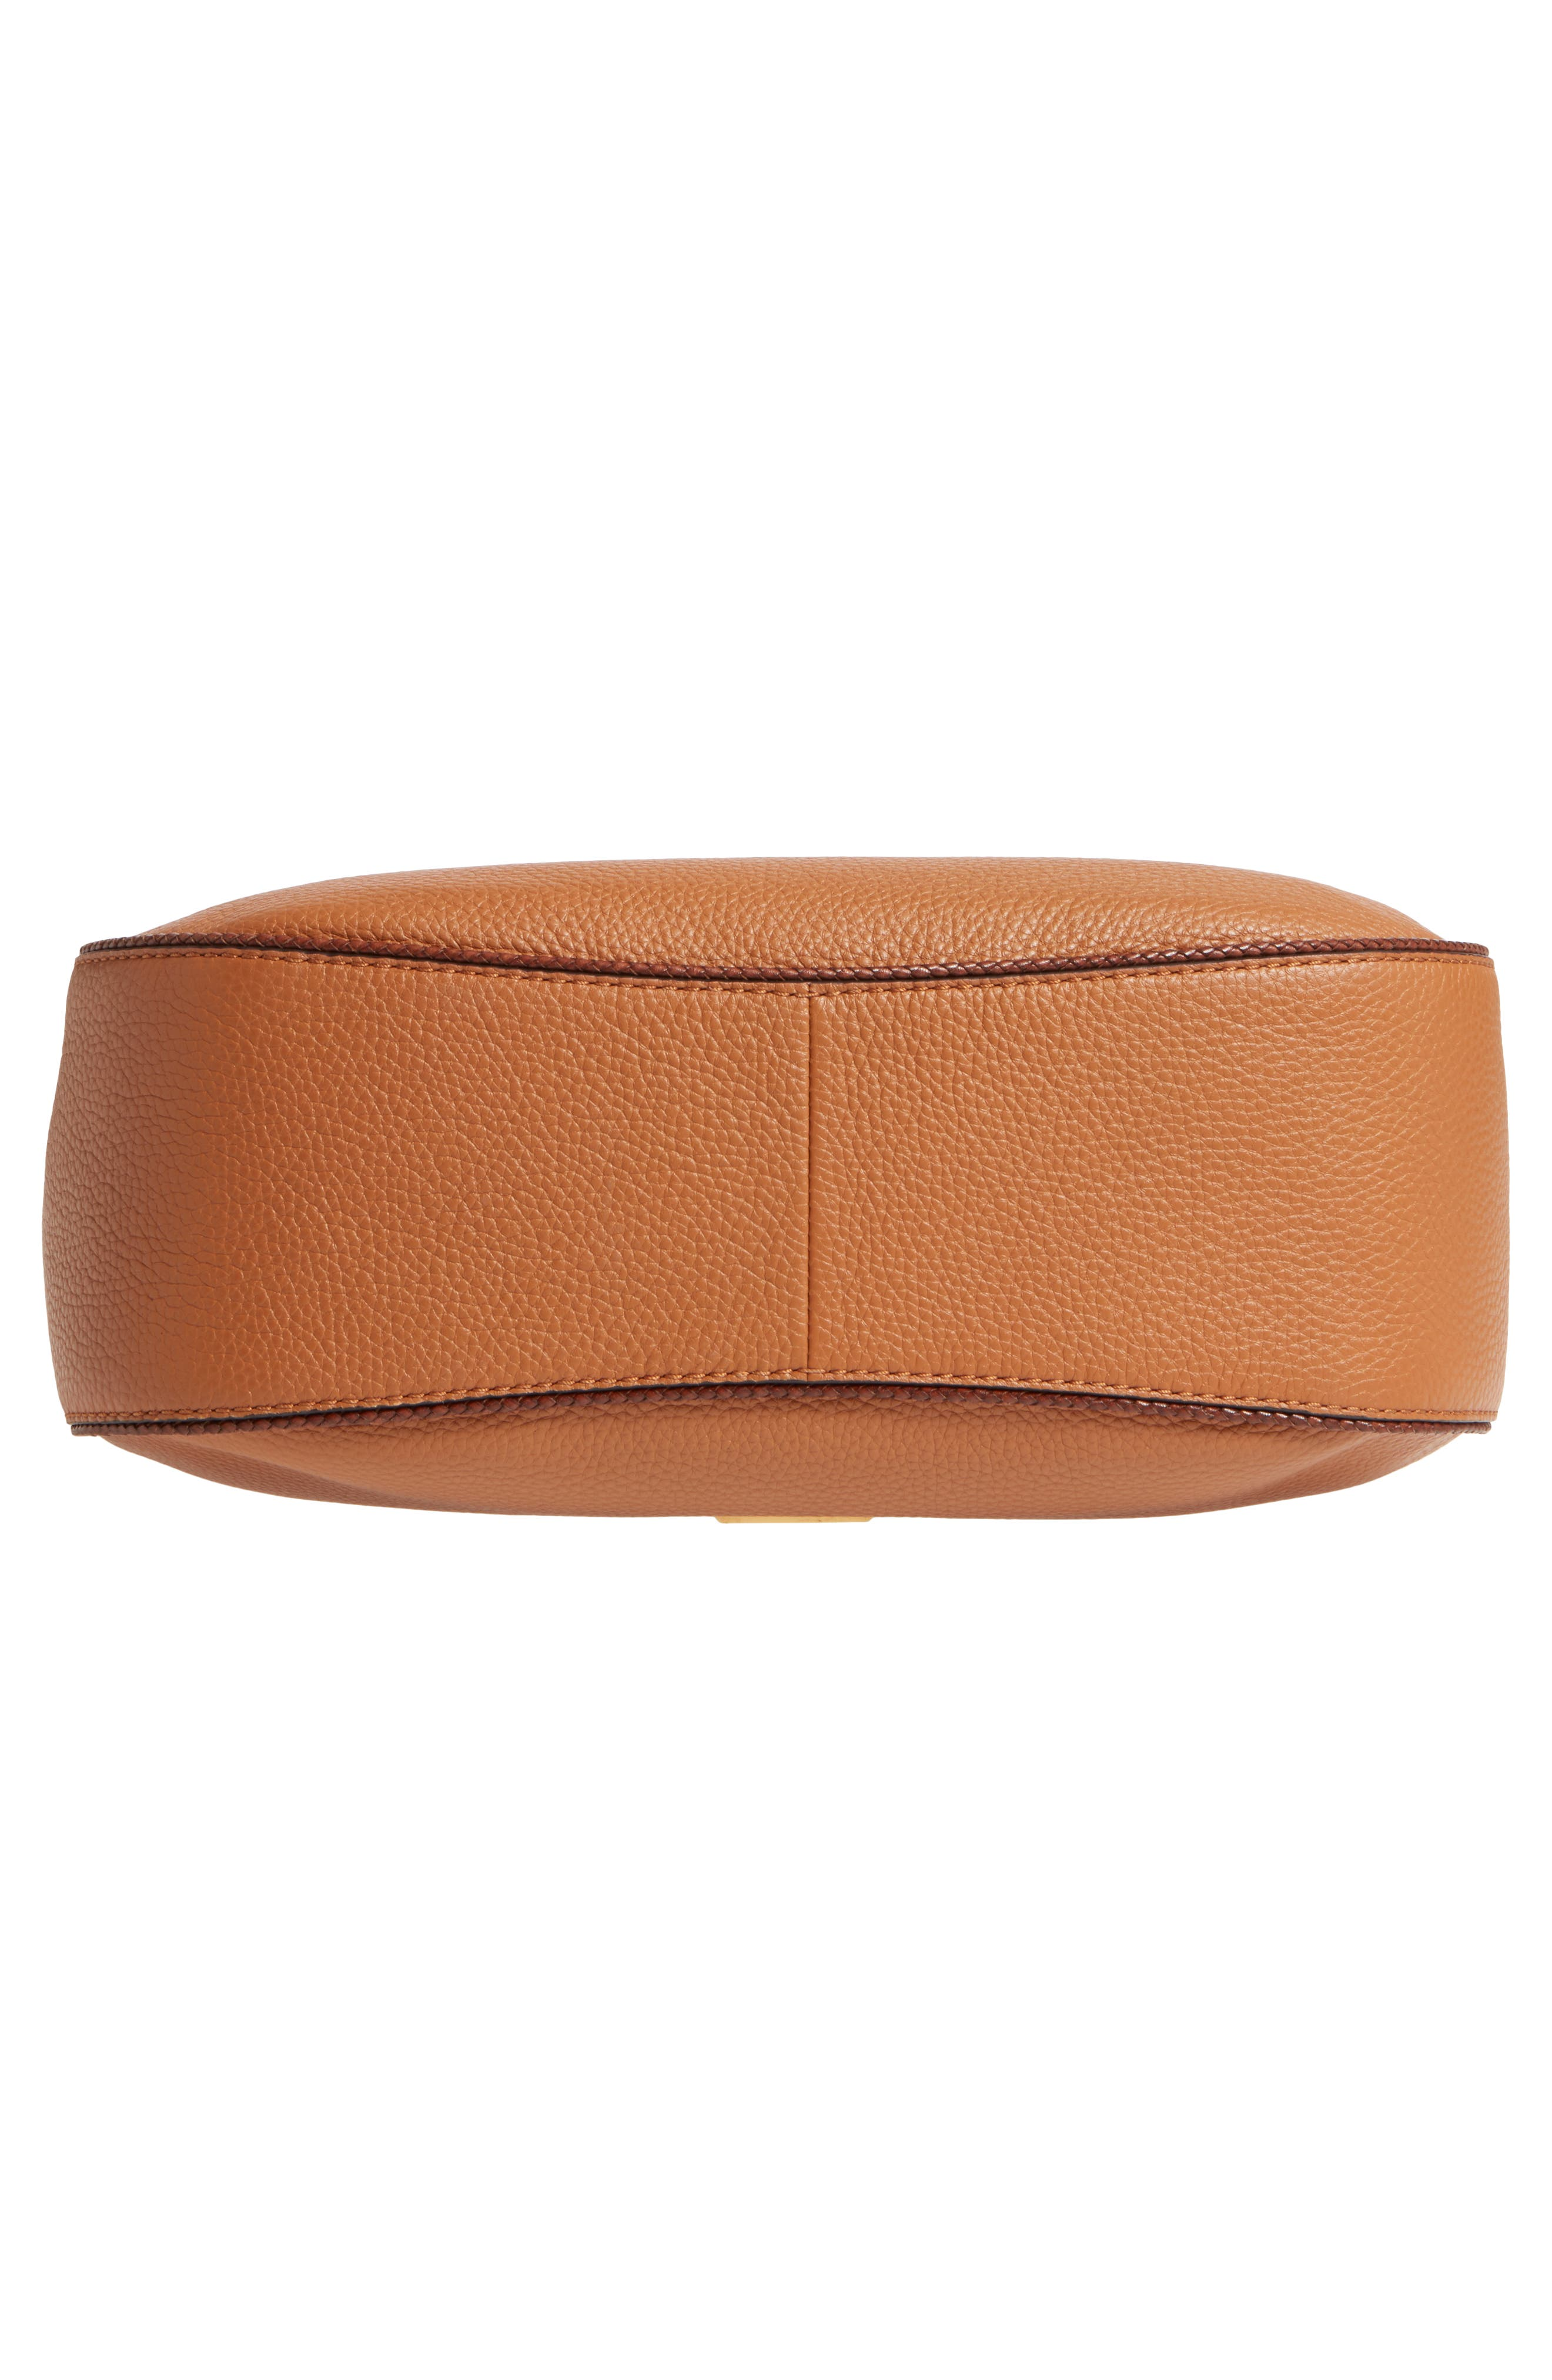 Alternate Image 5  - Michael Kors Skorpios Leather Hobo